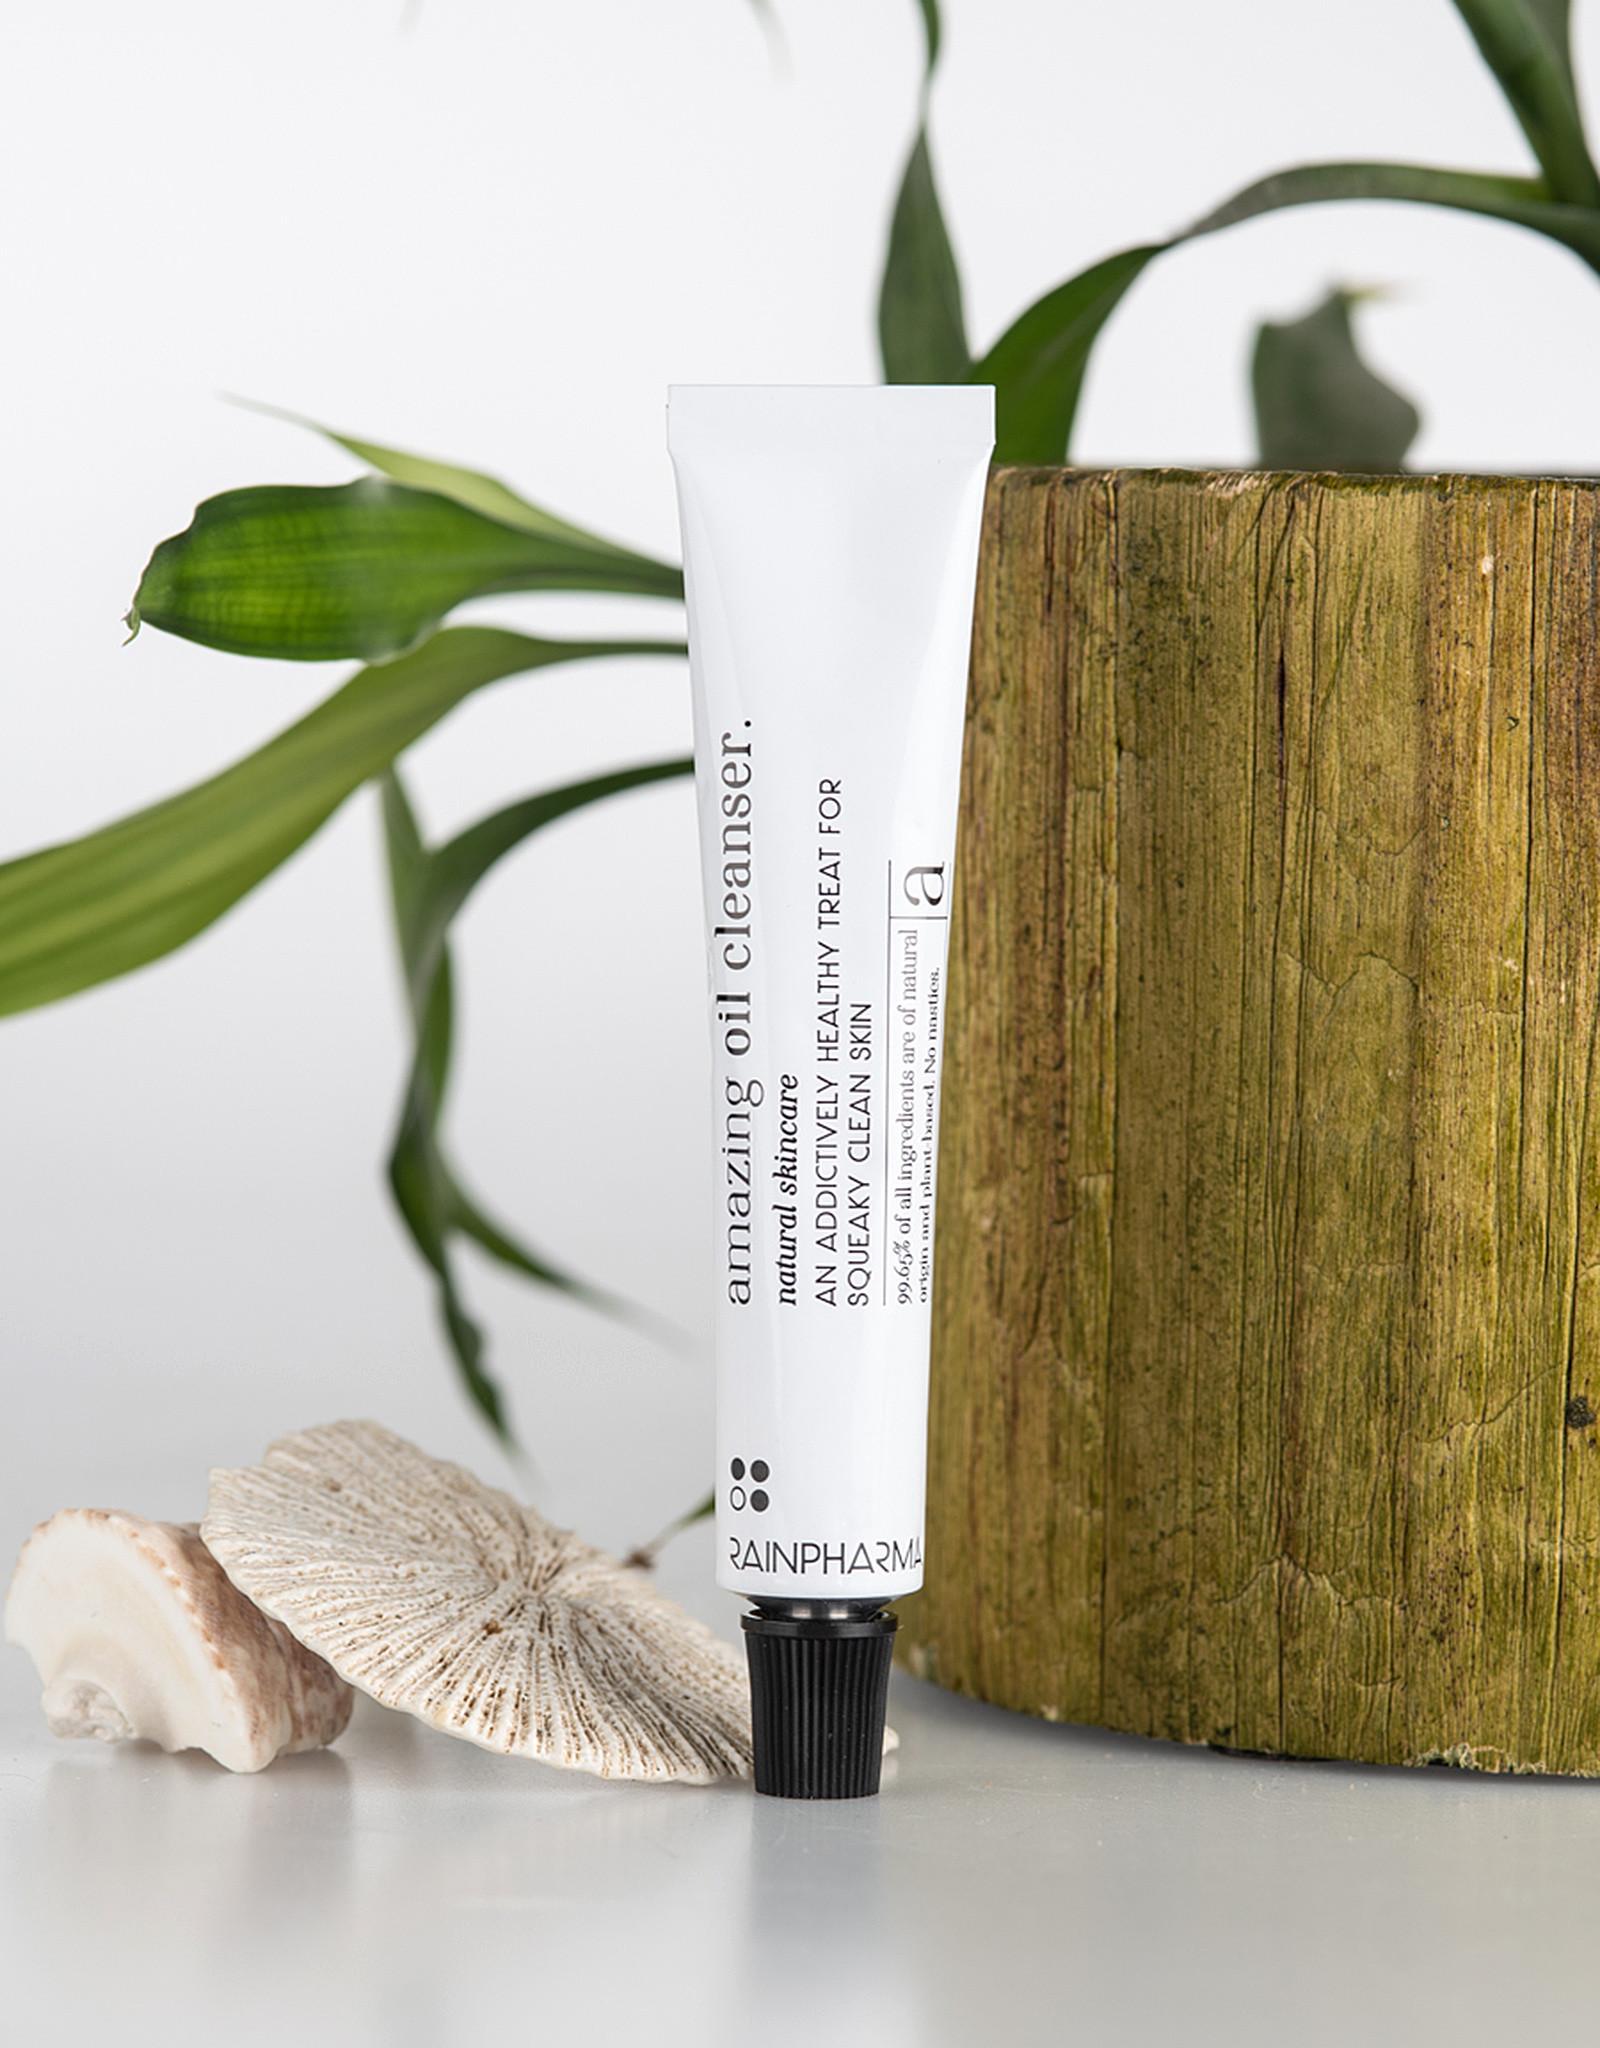 RainPharma TRAVEL - Amazing Oil Cleanser 20ml - Rainpharma